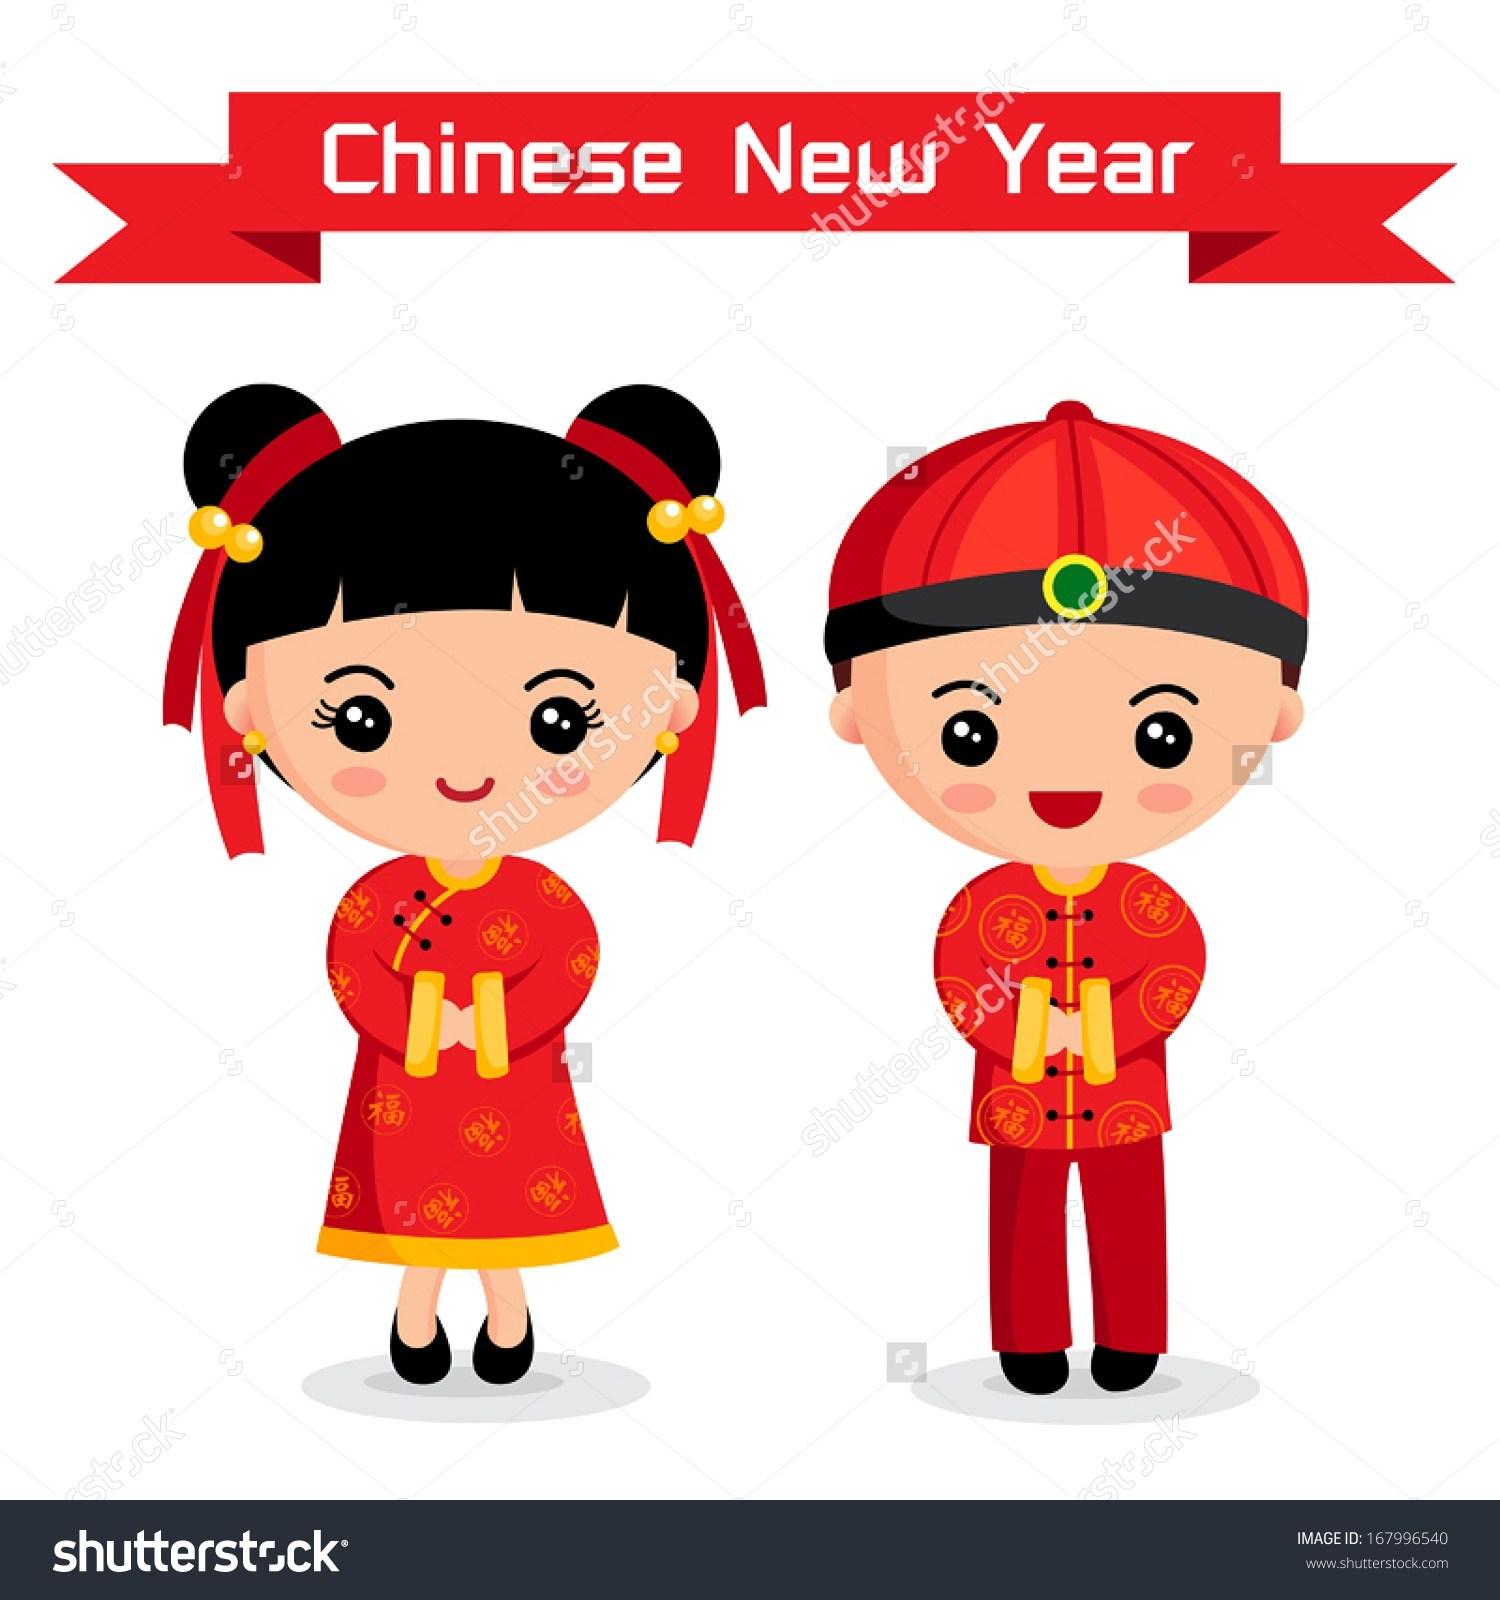 New year clip art. China clipart cute